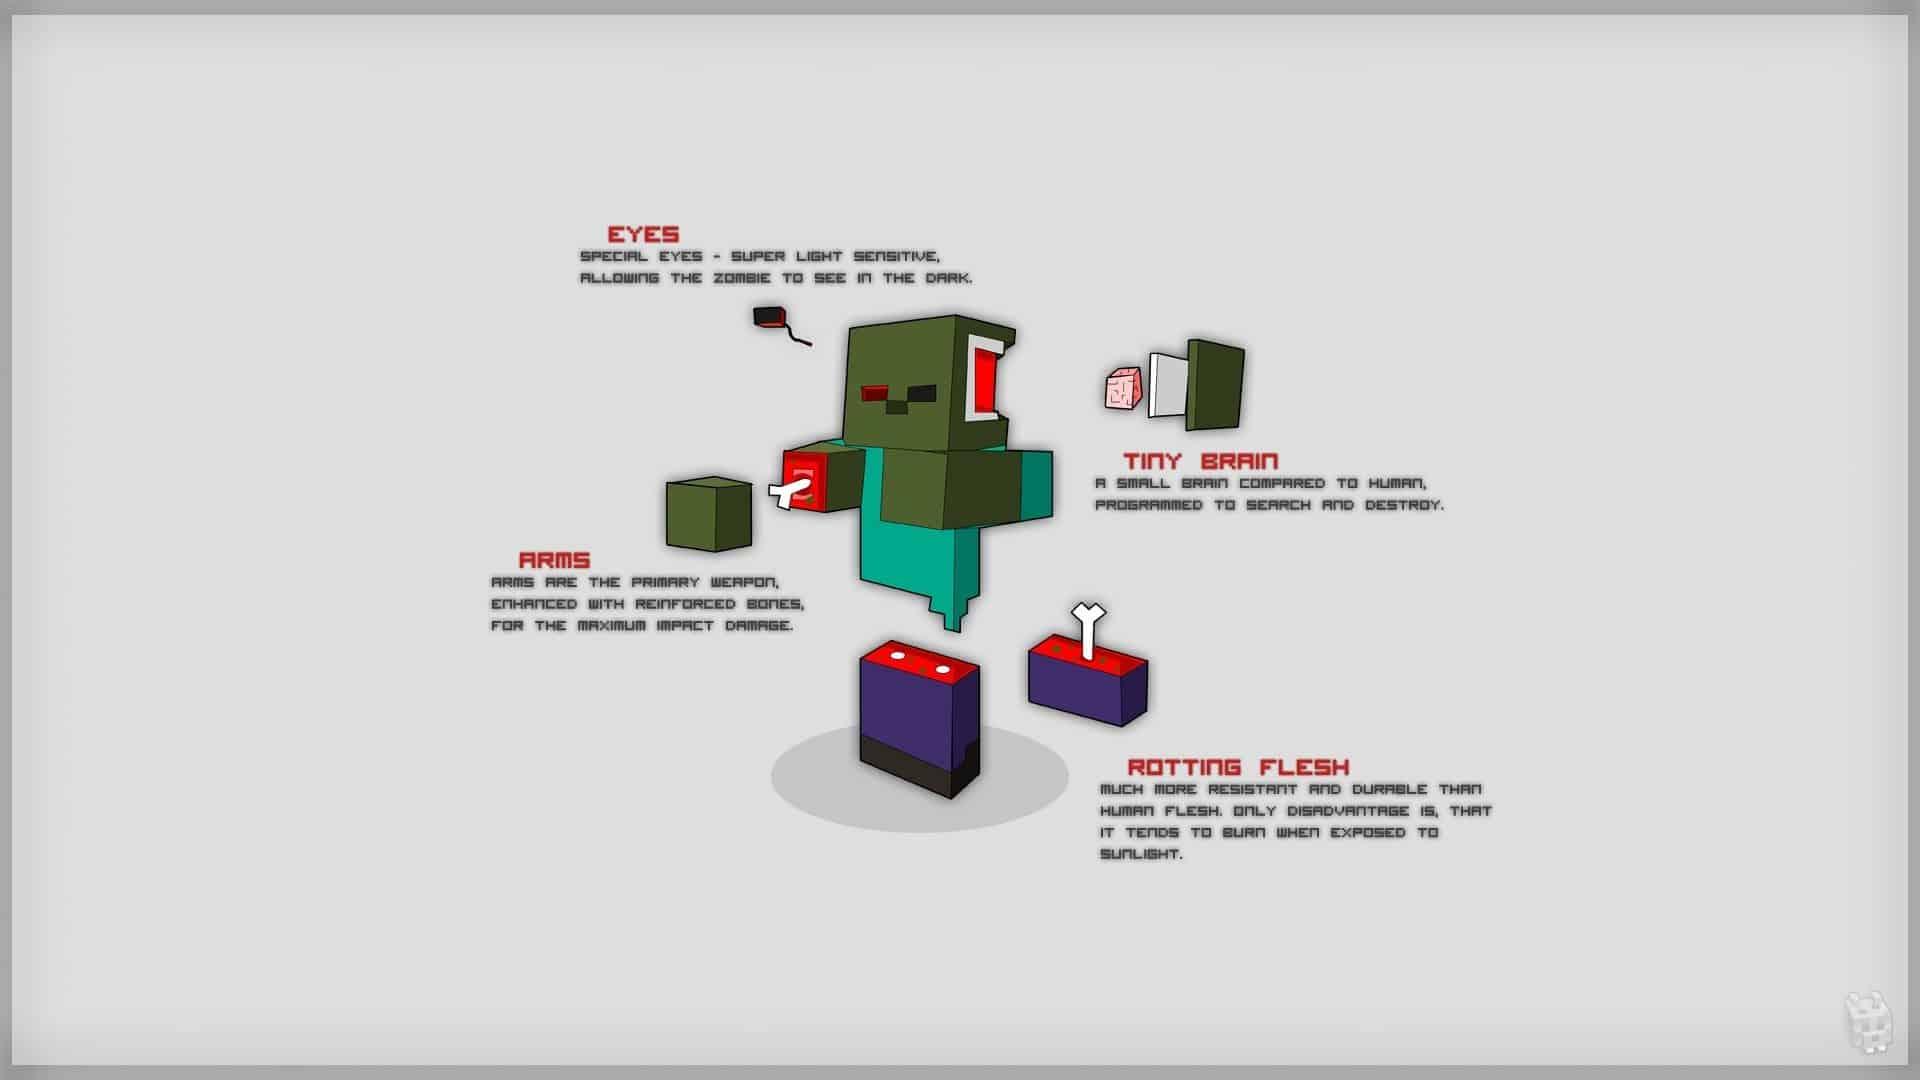 minecraft_zombie_anatomy_by_dentvanboo-d5mwh4b